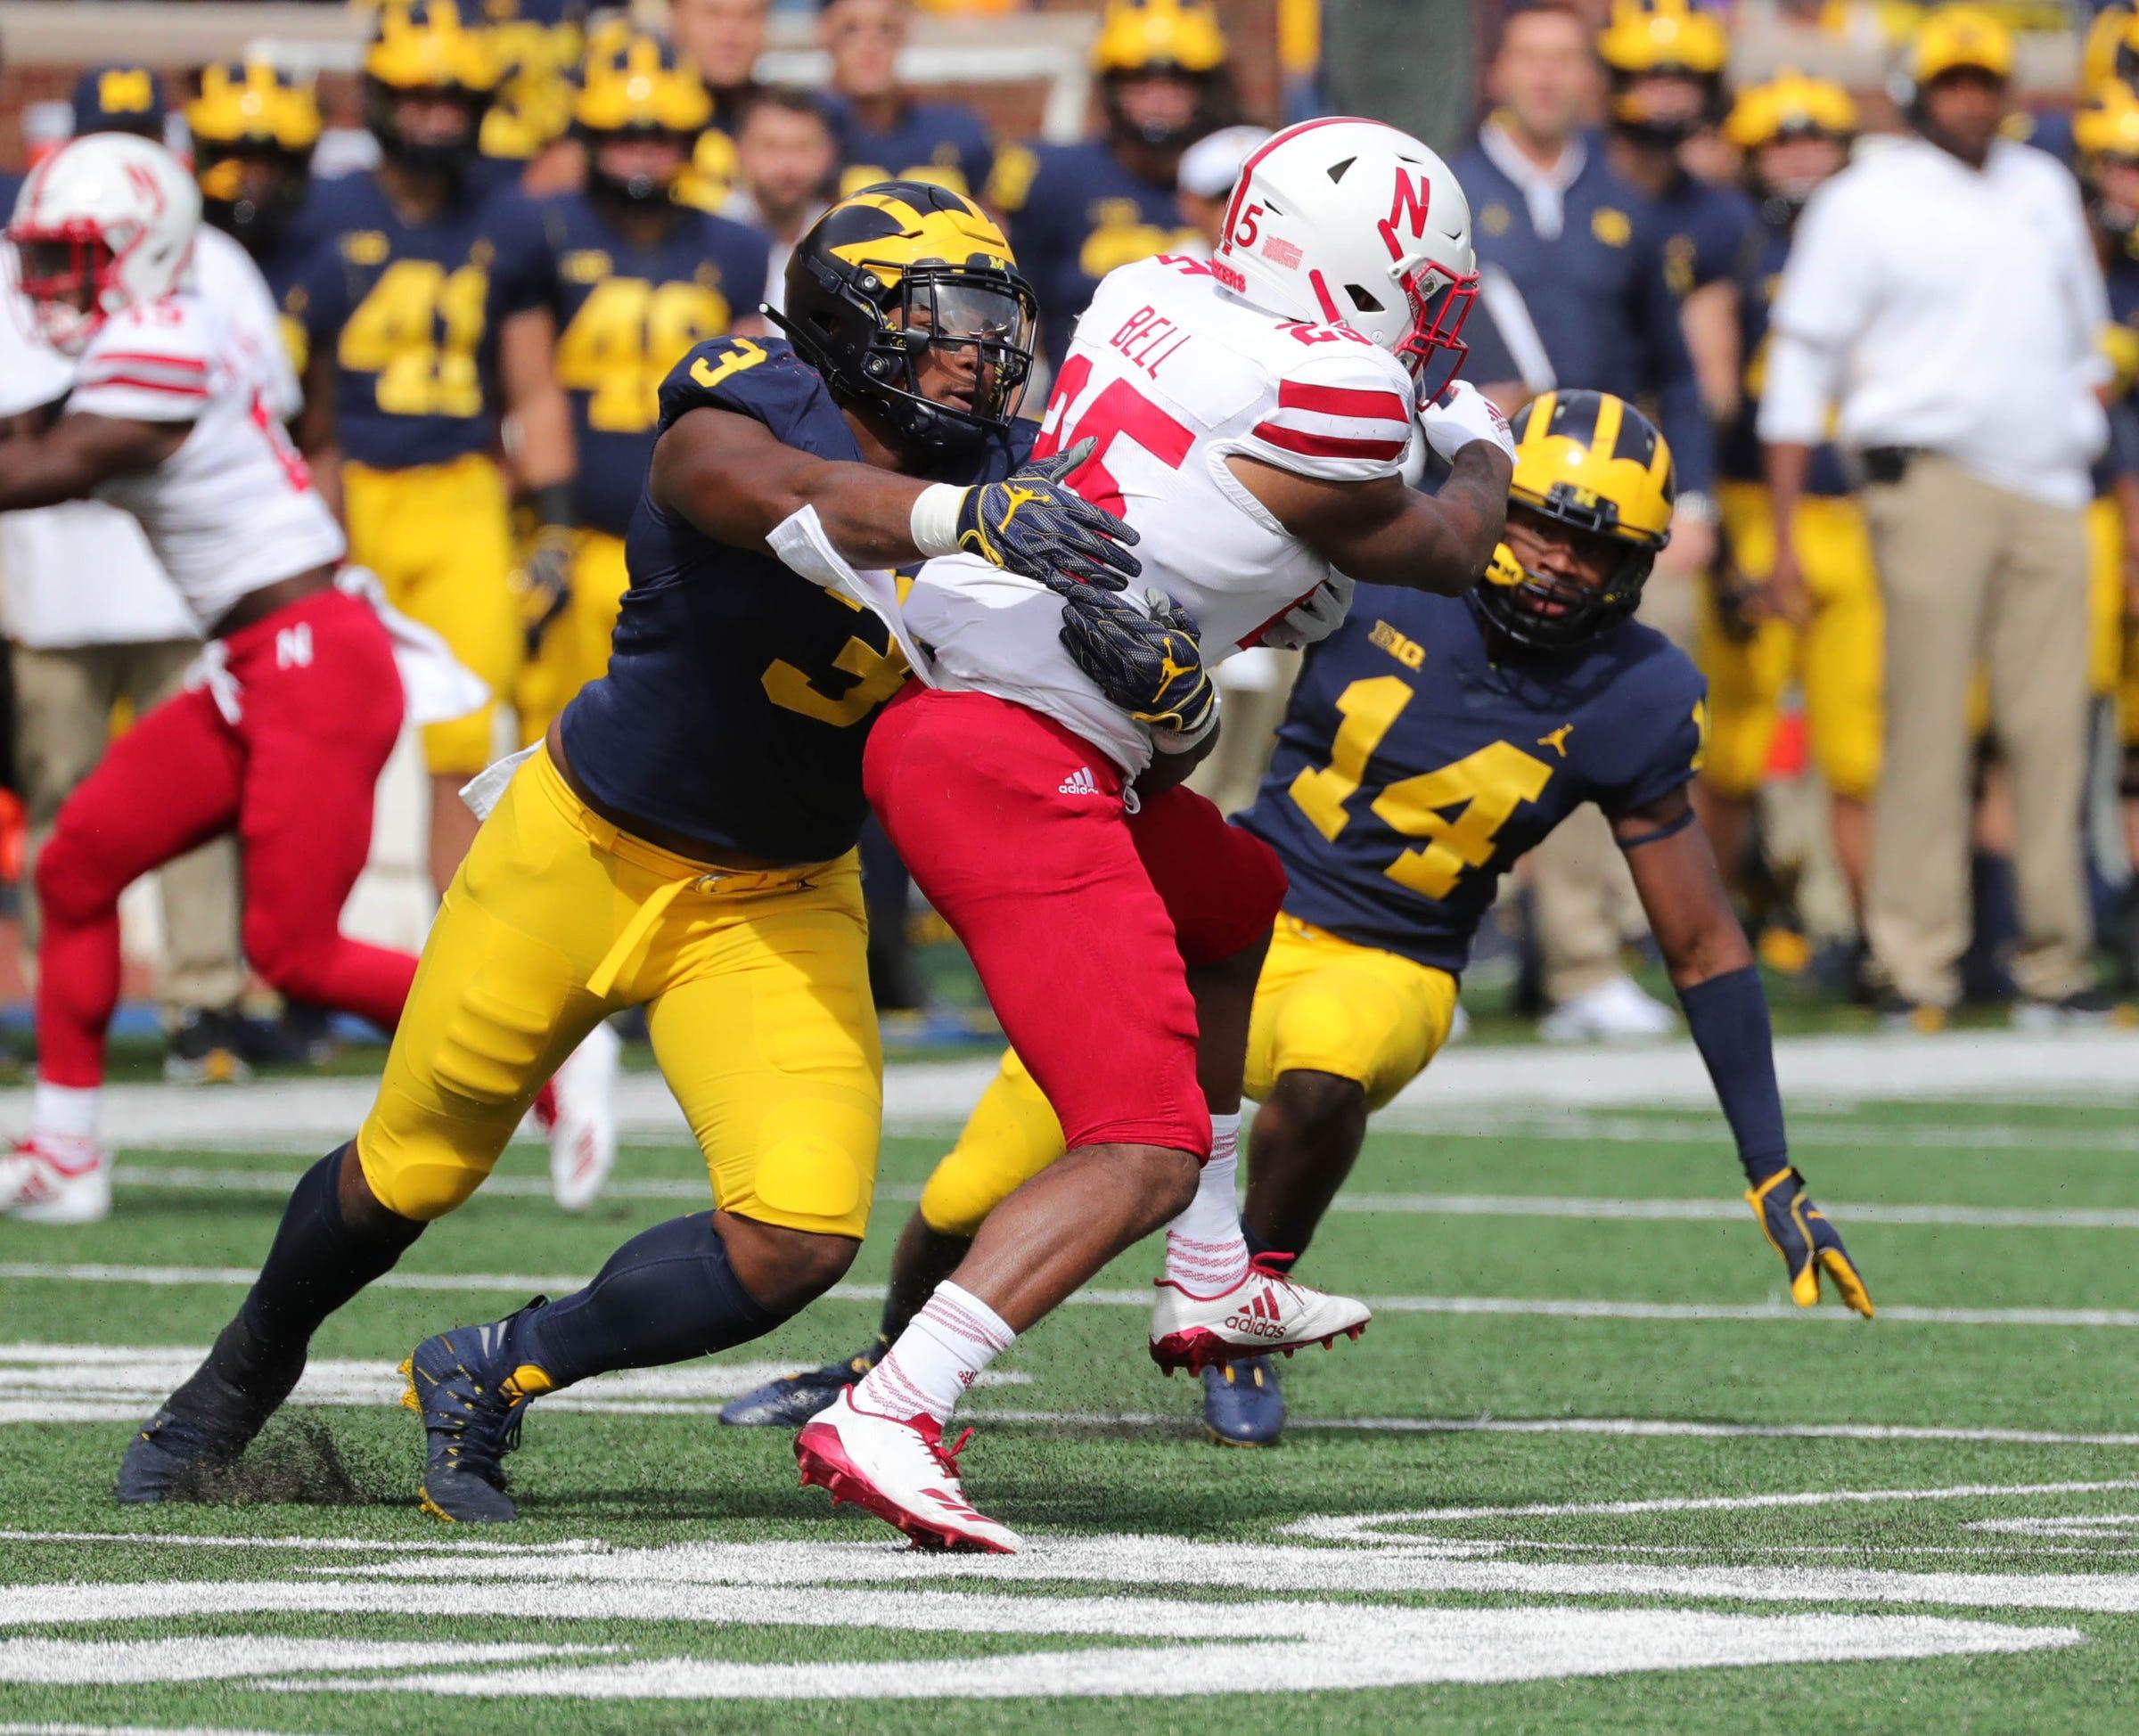 Michigan defenders Rashan Gary, left, and Josh Metellus tackle Nebraska running back Greg Bell during the first half on Saturday, Sept. 22, 2018, at Michigan Stadium.